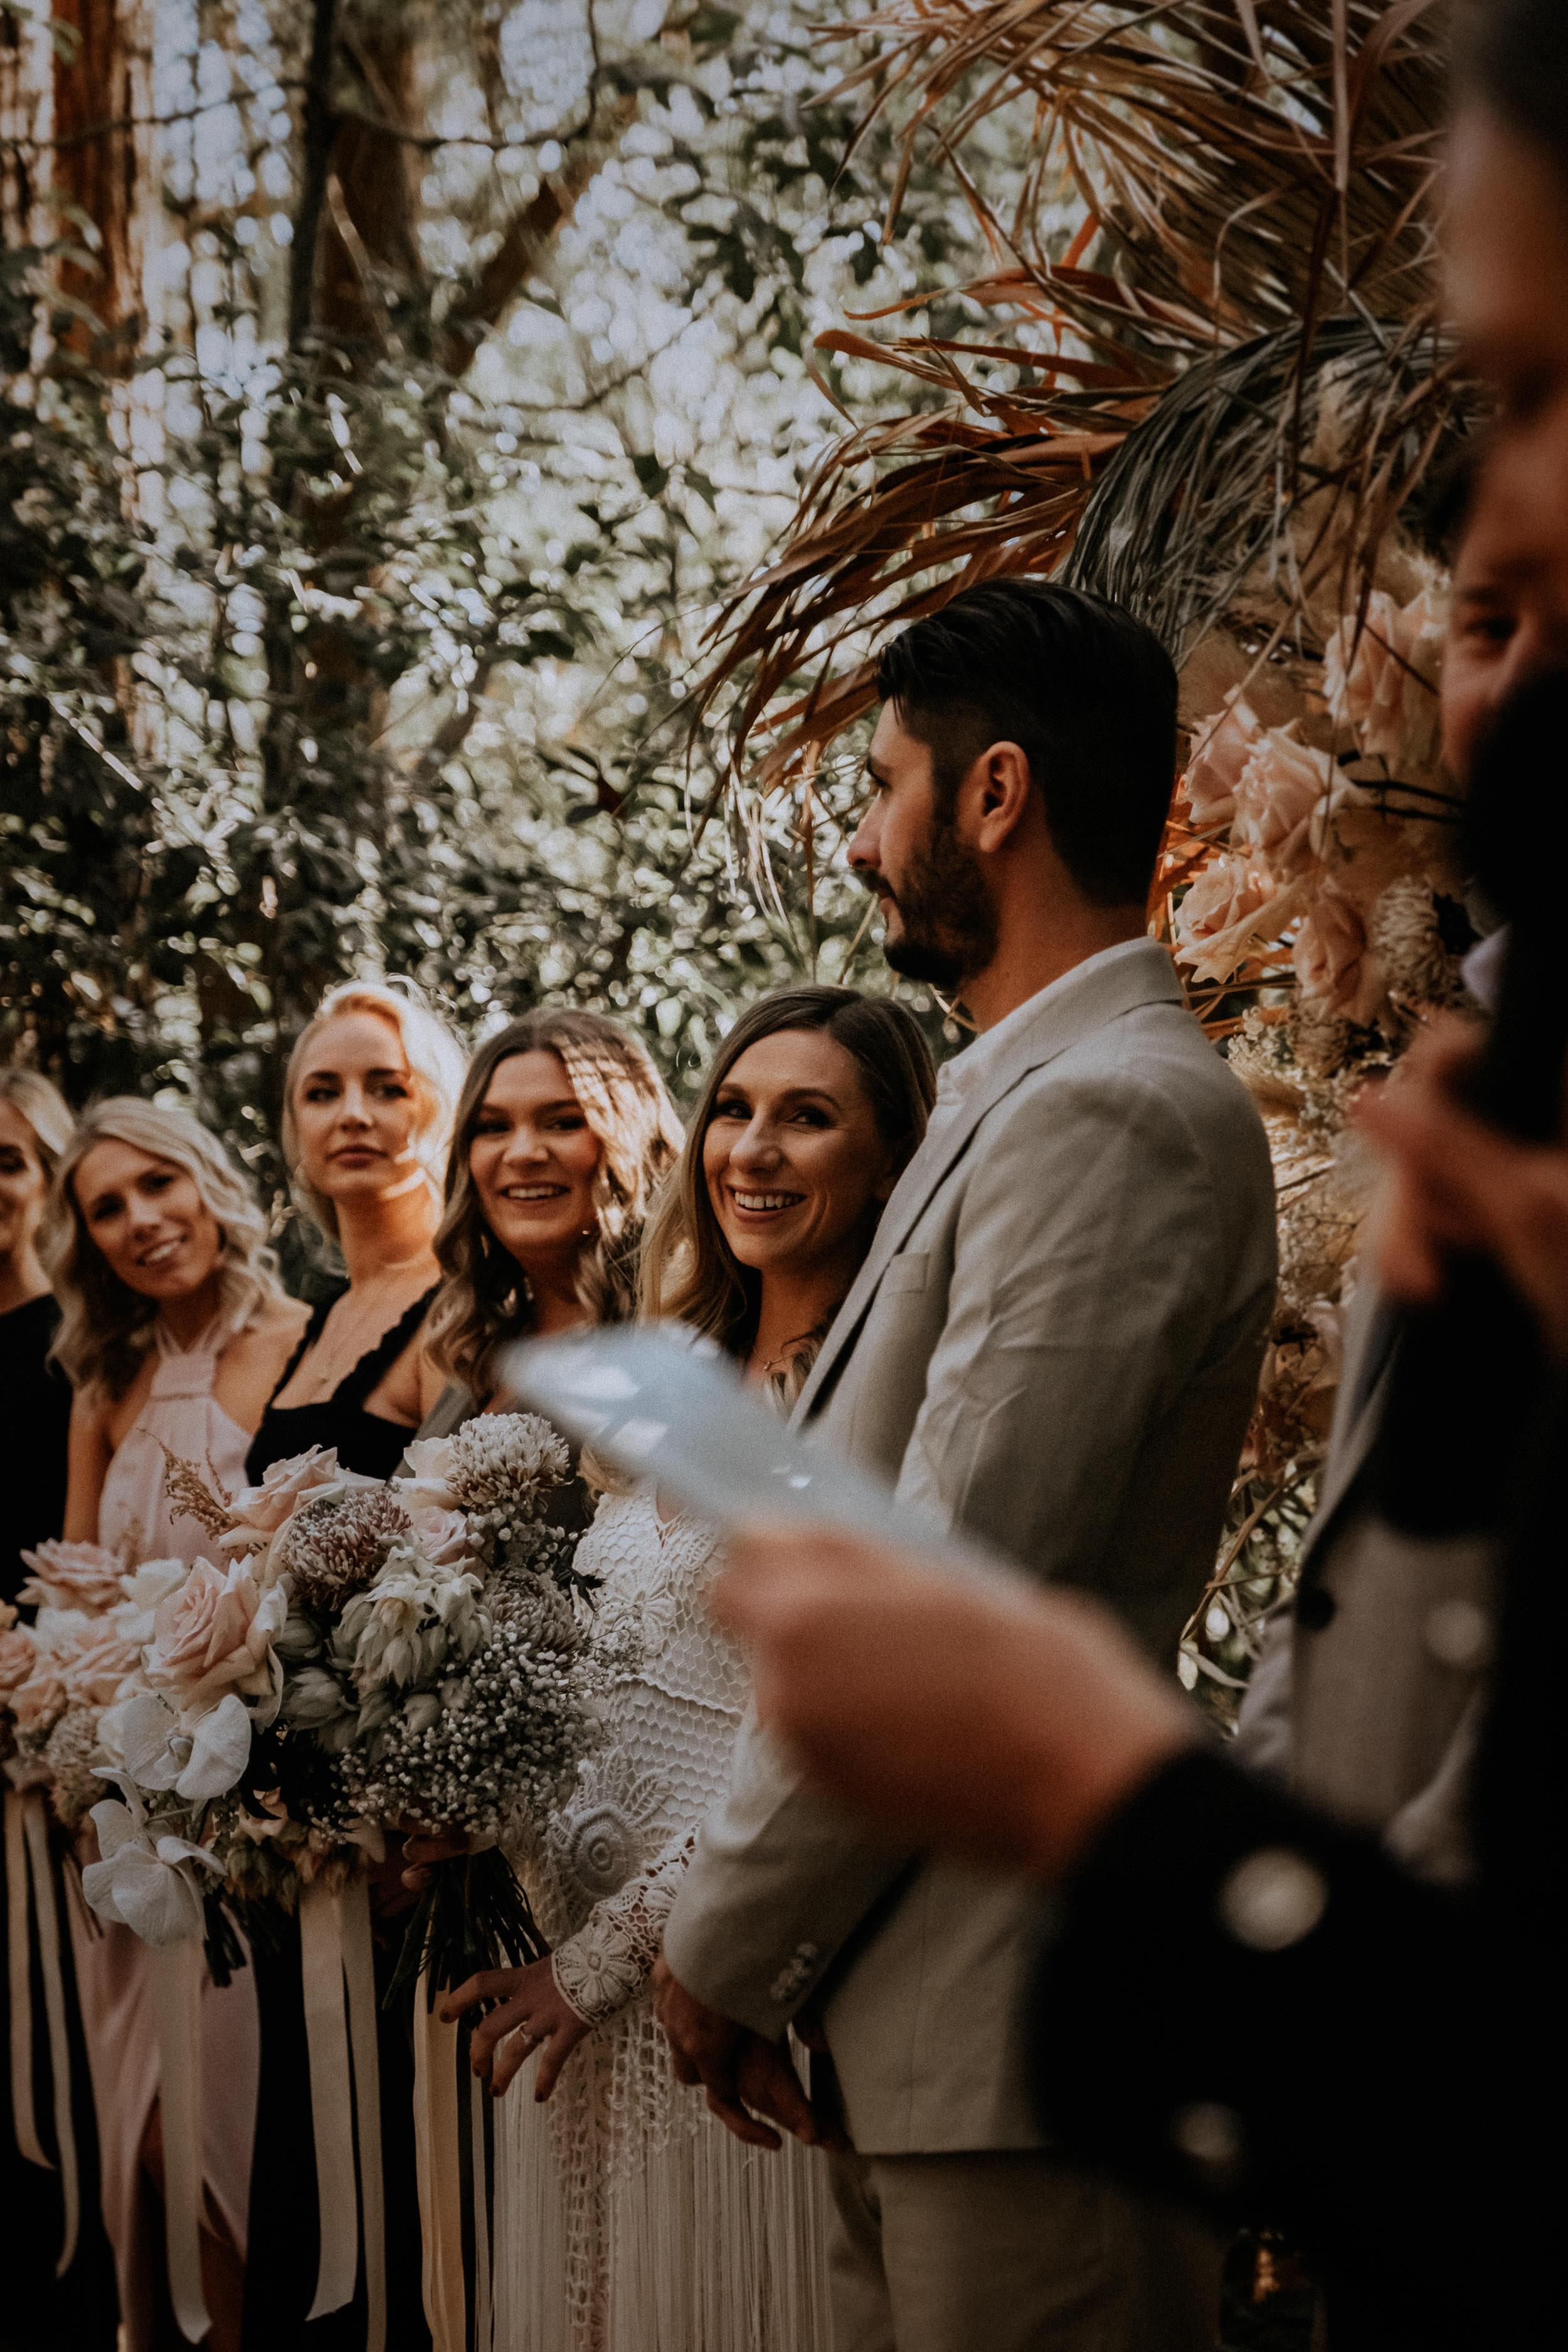 S&A Elopement - Kings & Thieves - Shred 'Til Dead - Central Coast Beach Forest Wedding - 181.jpg